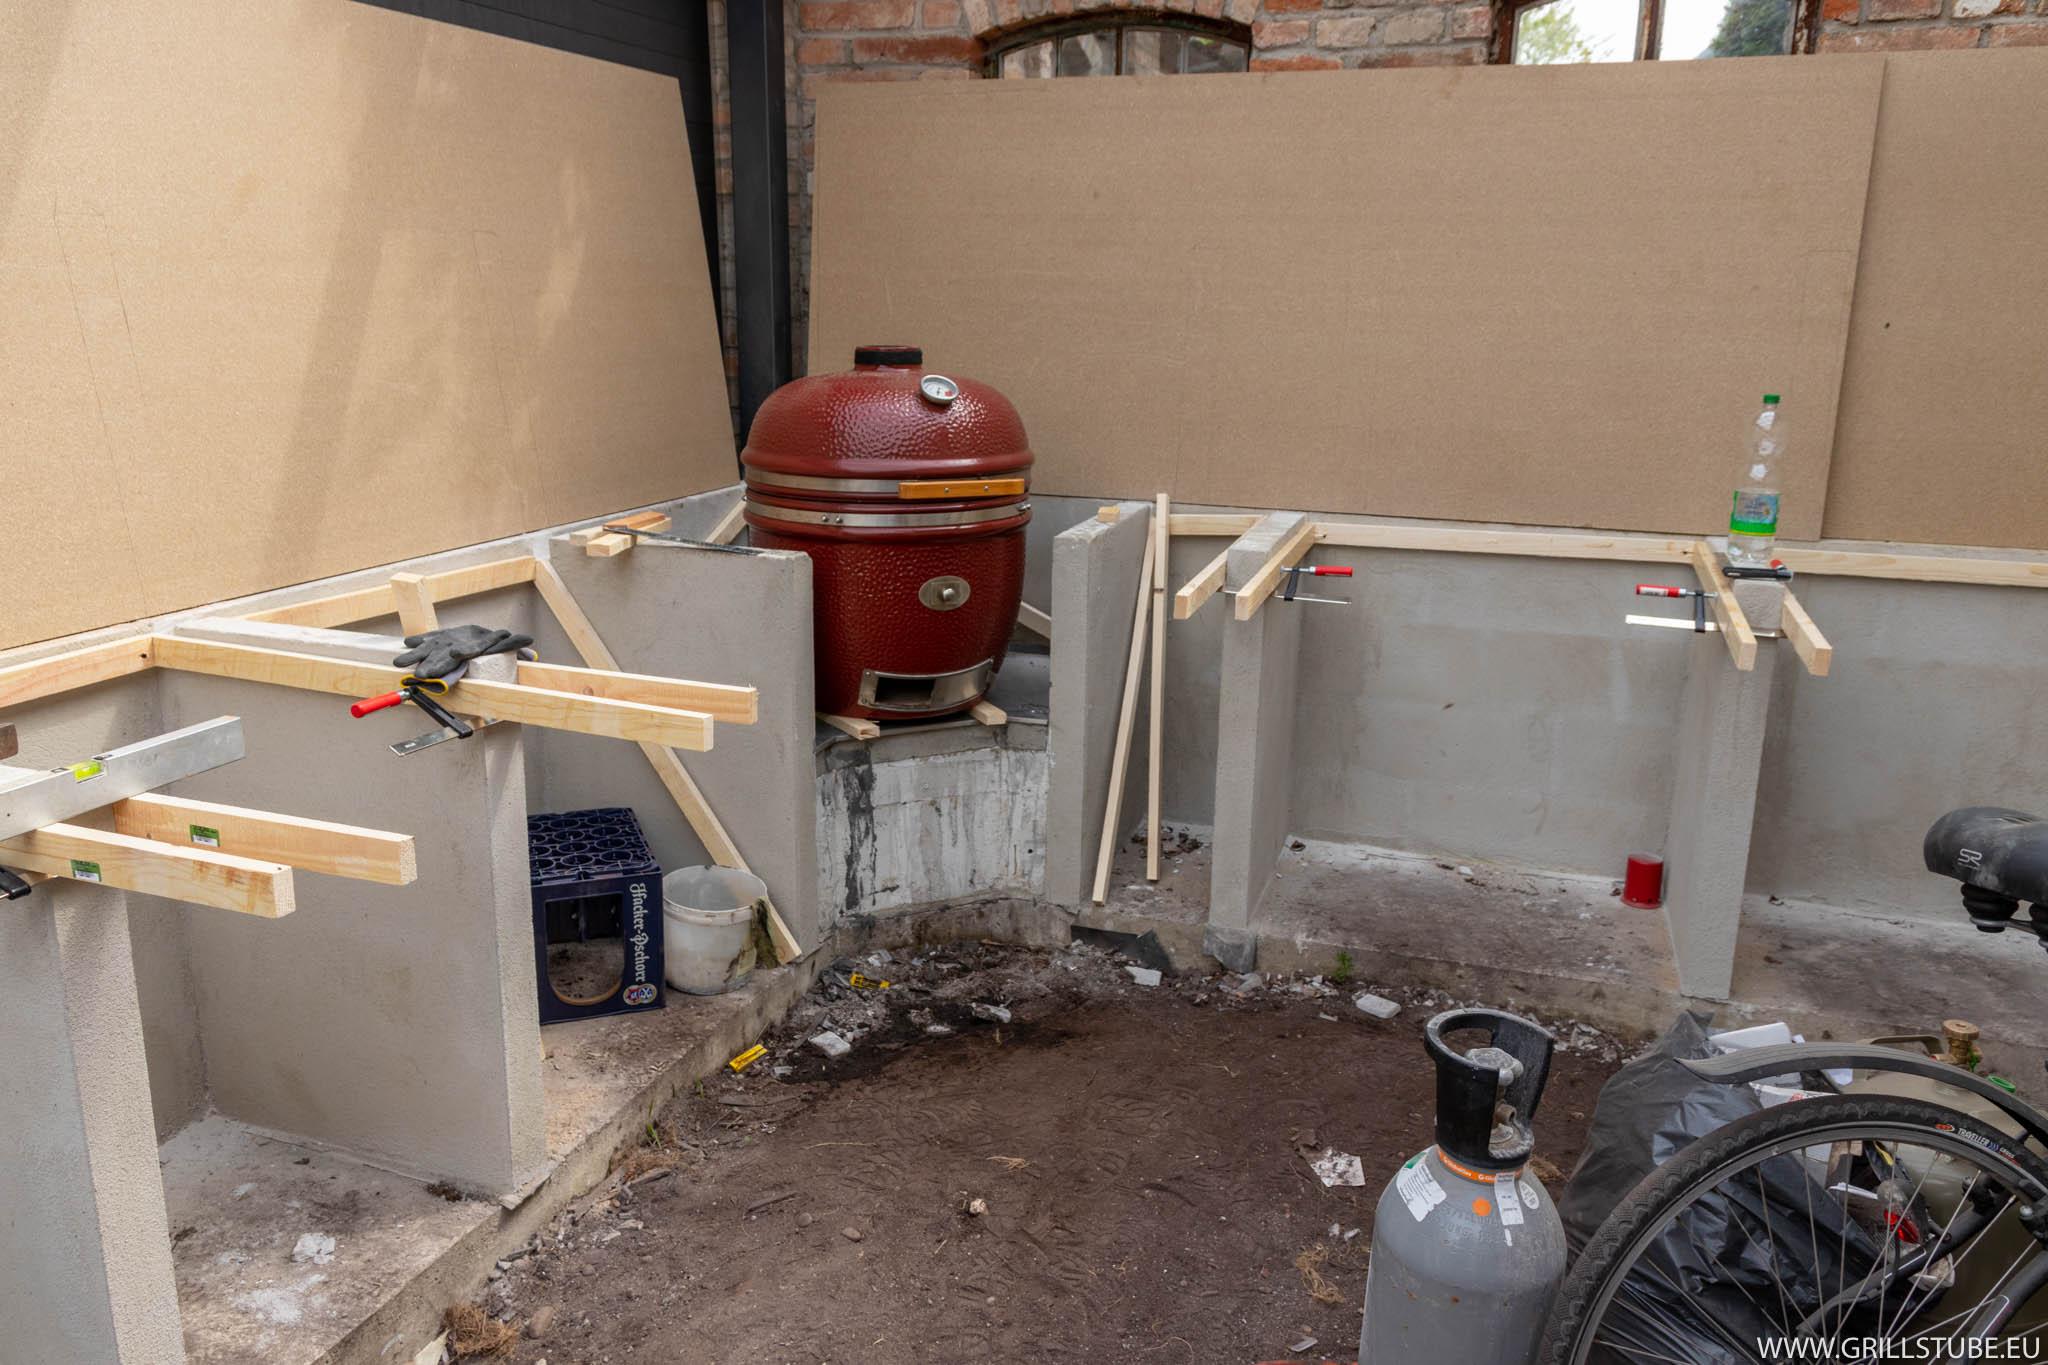 Outdoor Küche Kugelgrill : Outdoorküche: schalung der arbeitsplatte teil1 andys grillstube 2.0